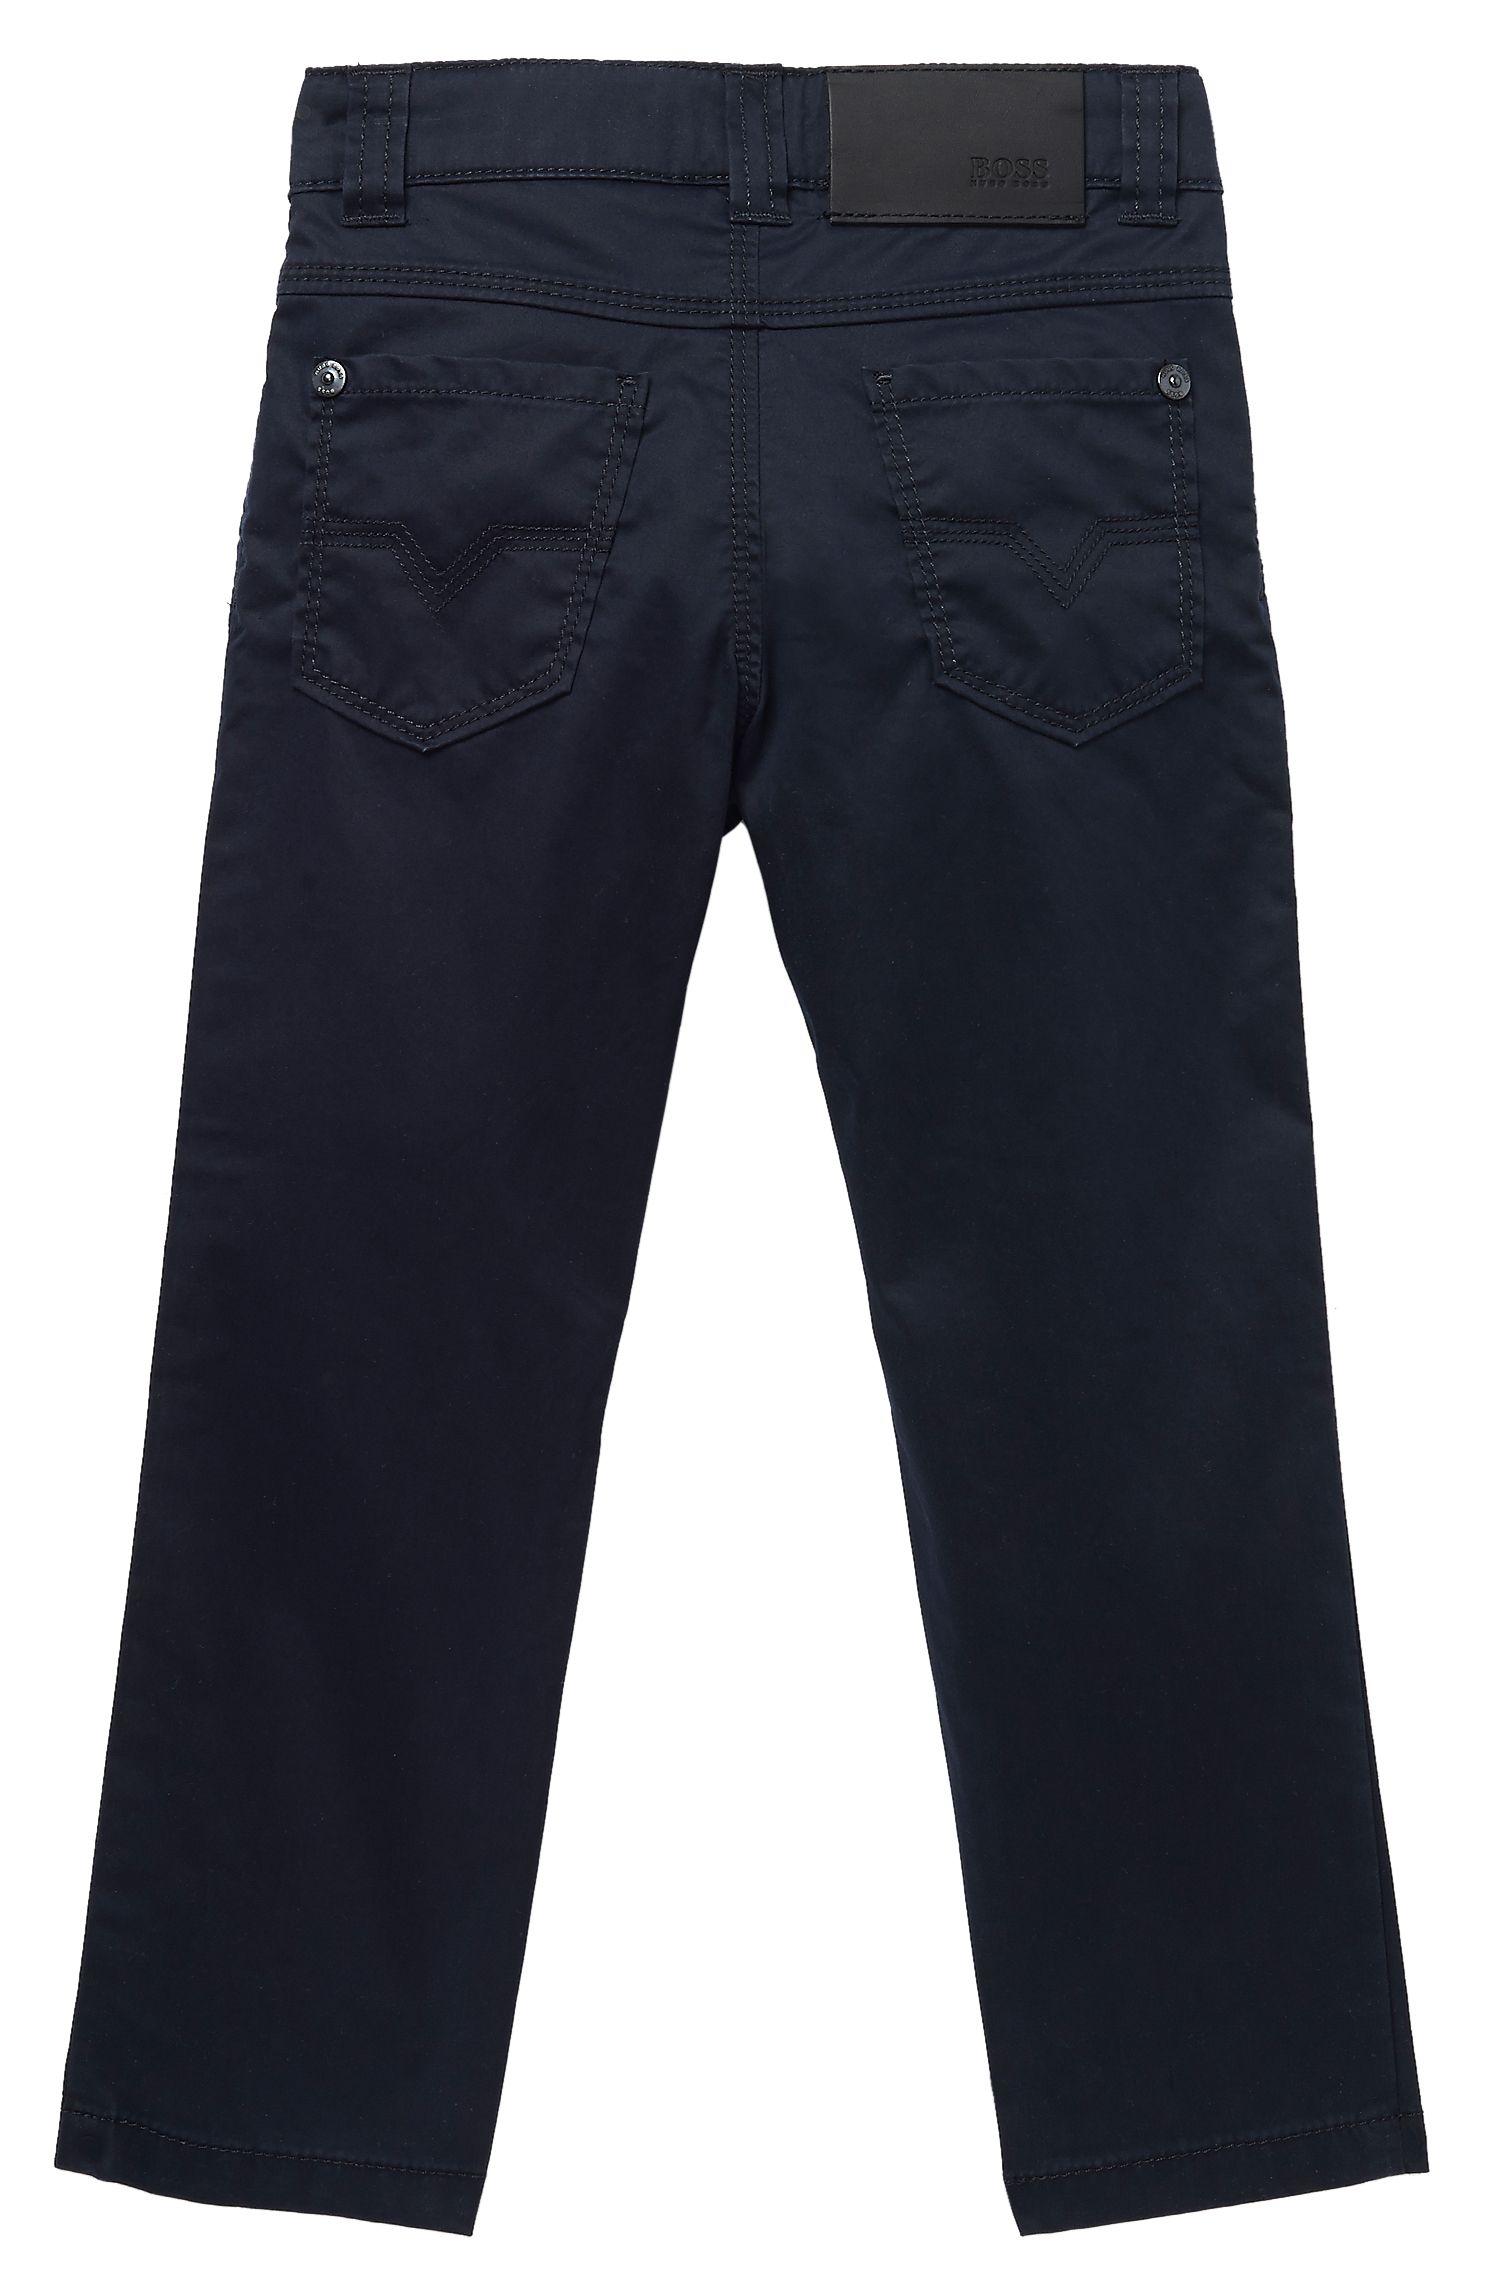 'J24288' | Boys Cotton Twill Pants